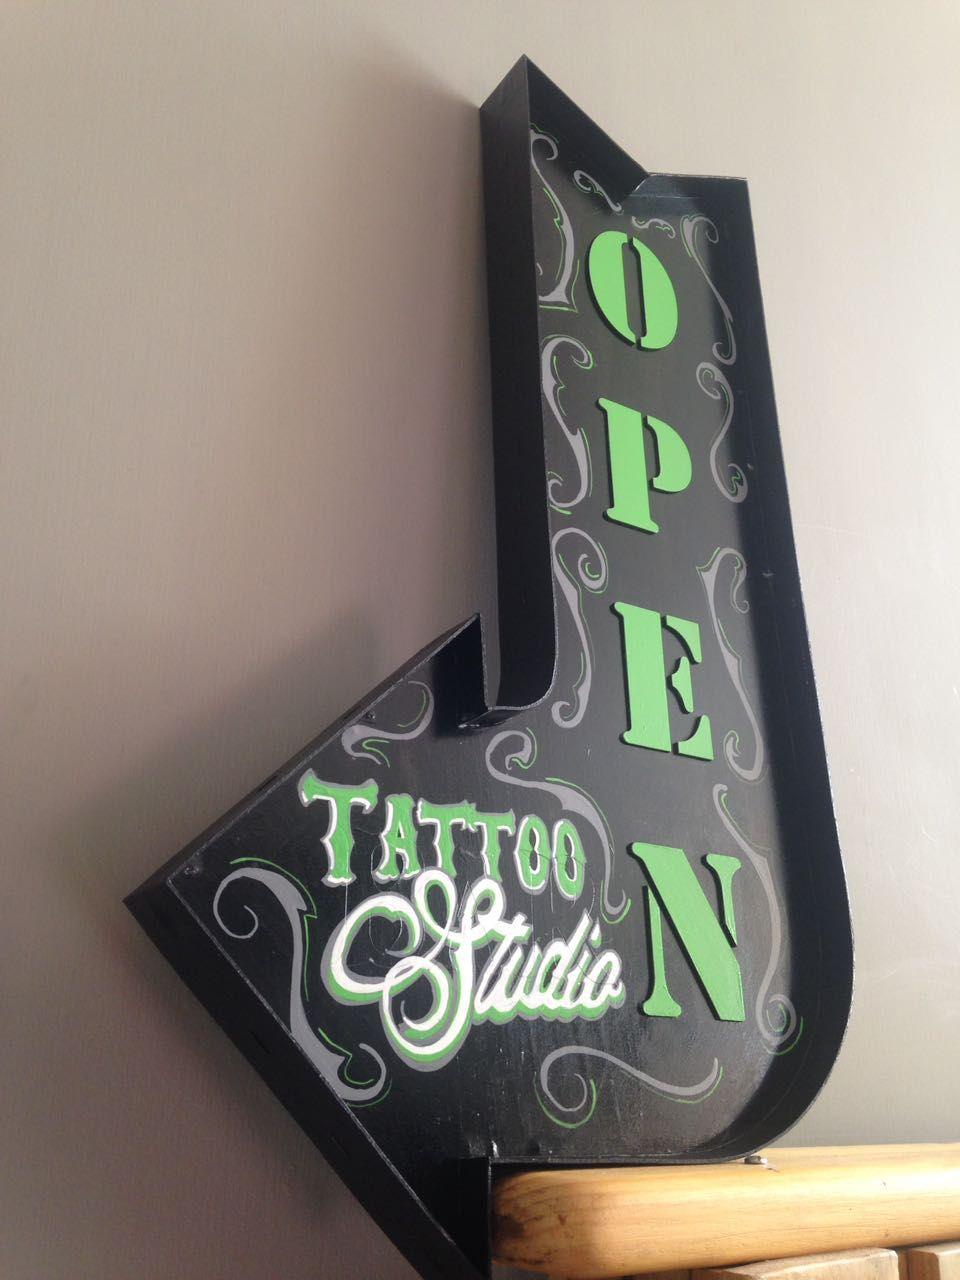 Letrero open tattoo studio letreros tatuajes y unicose